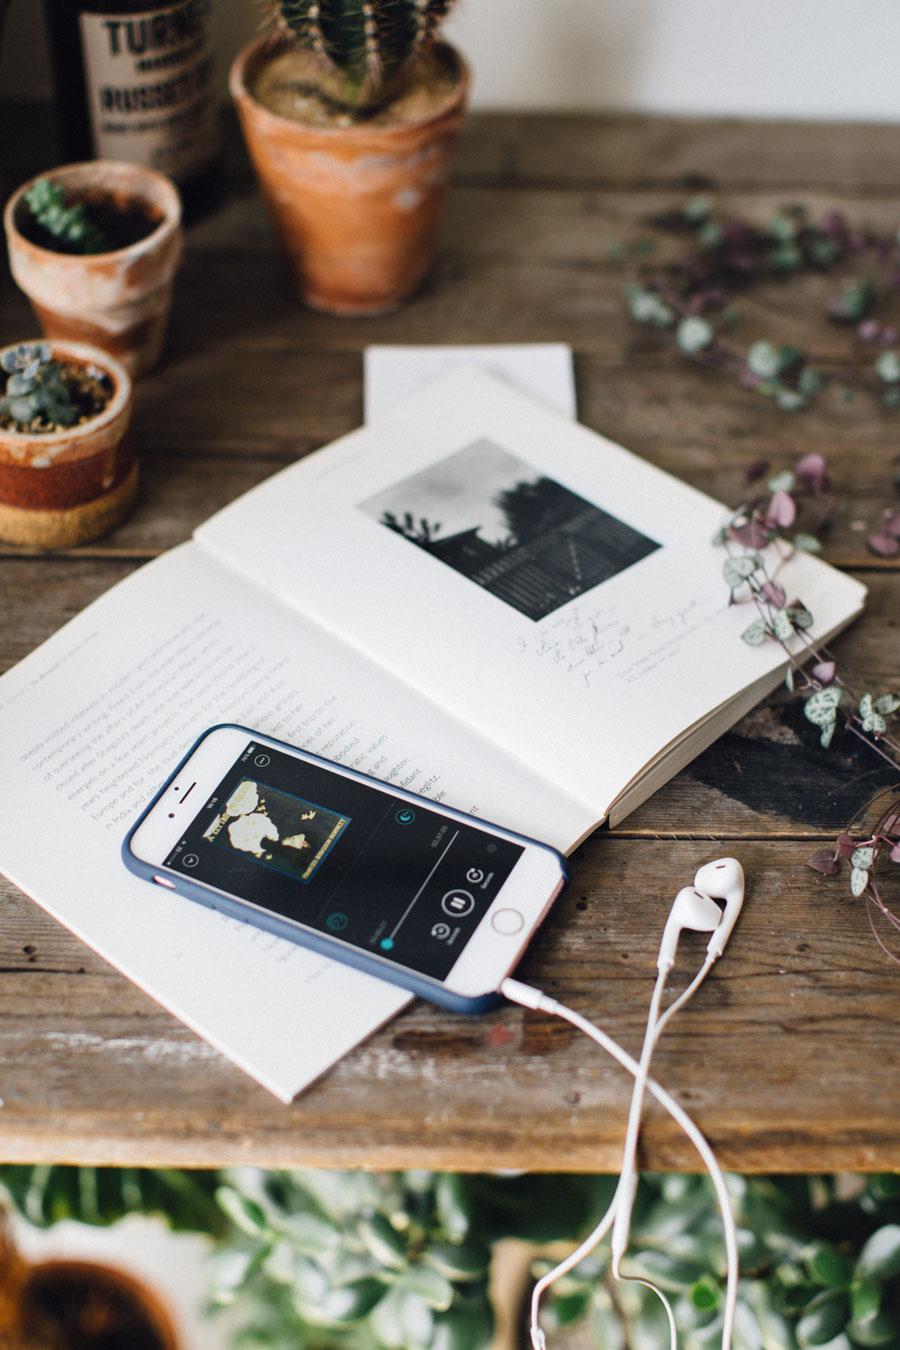 Bookbeat Audiobook App